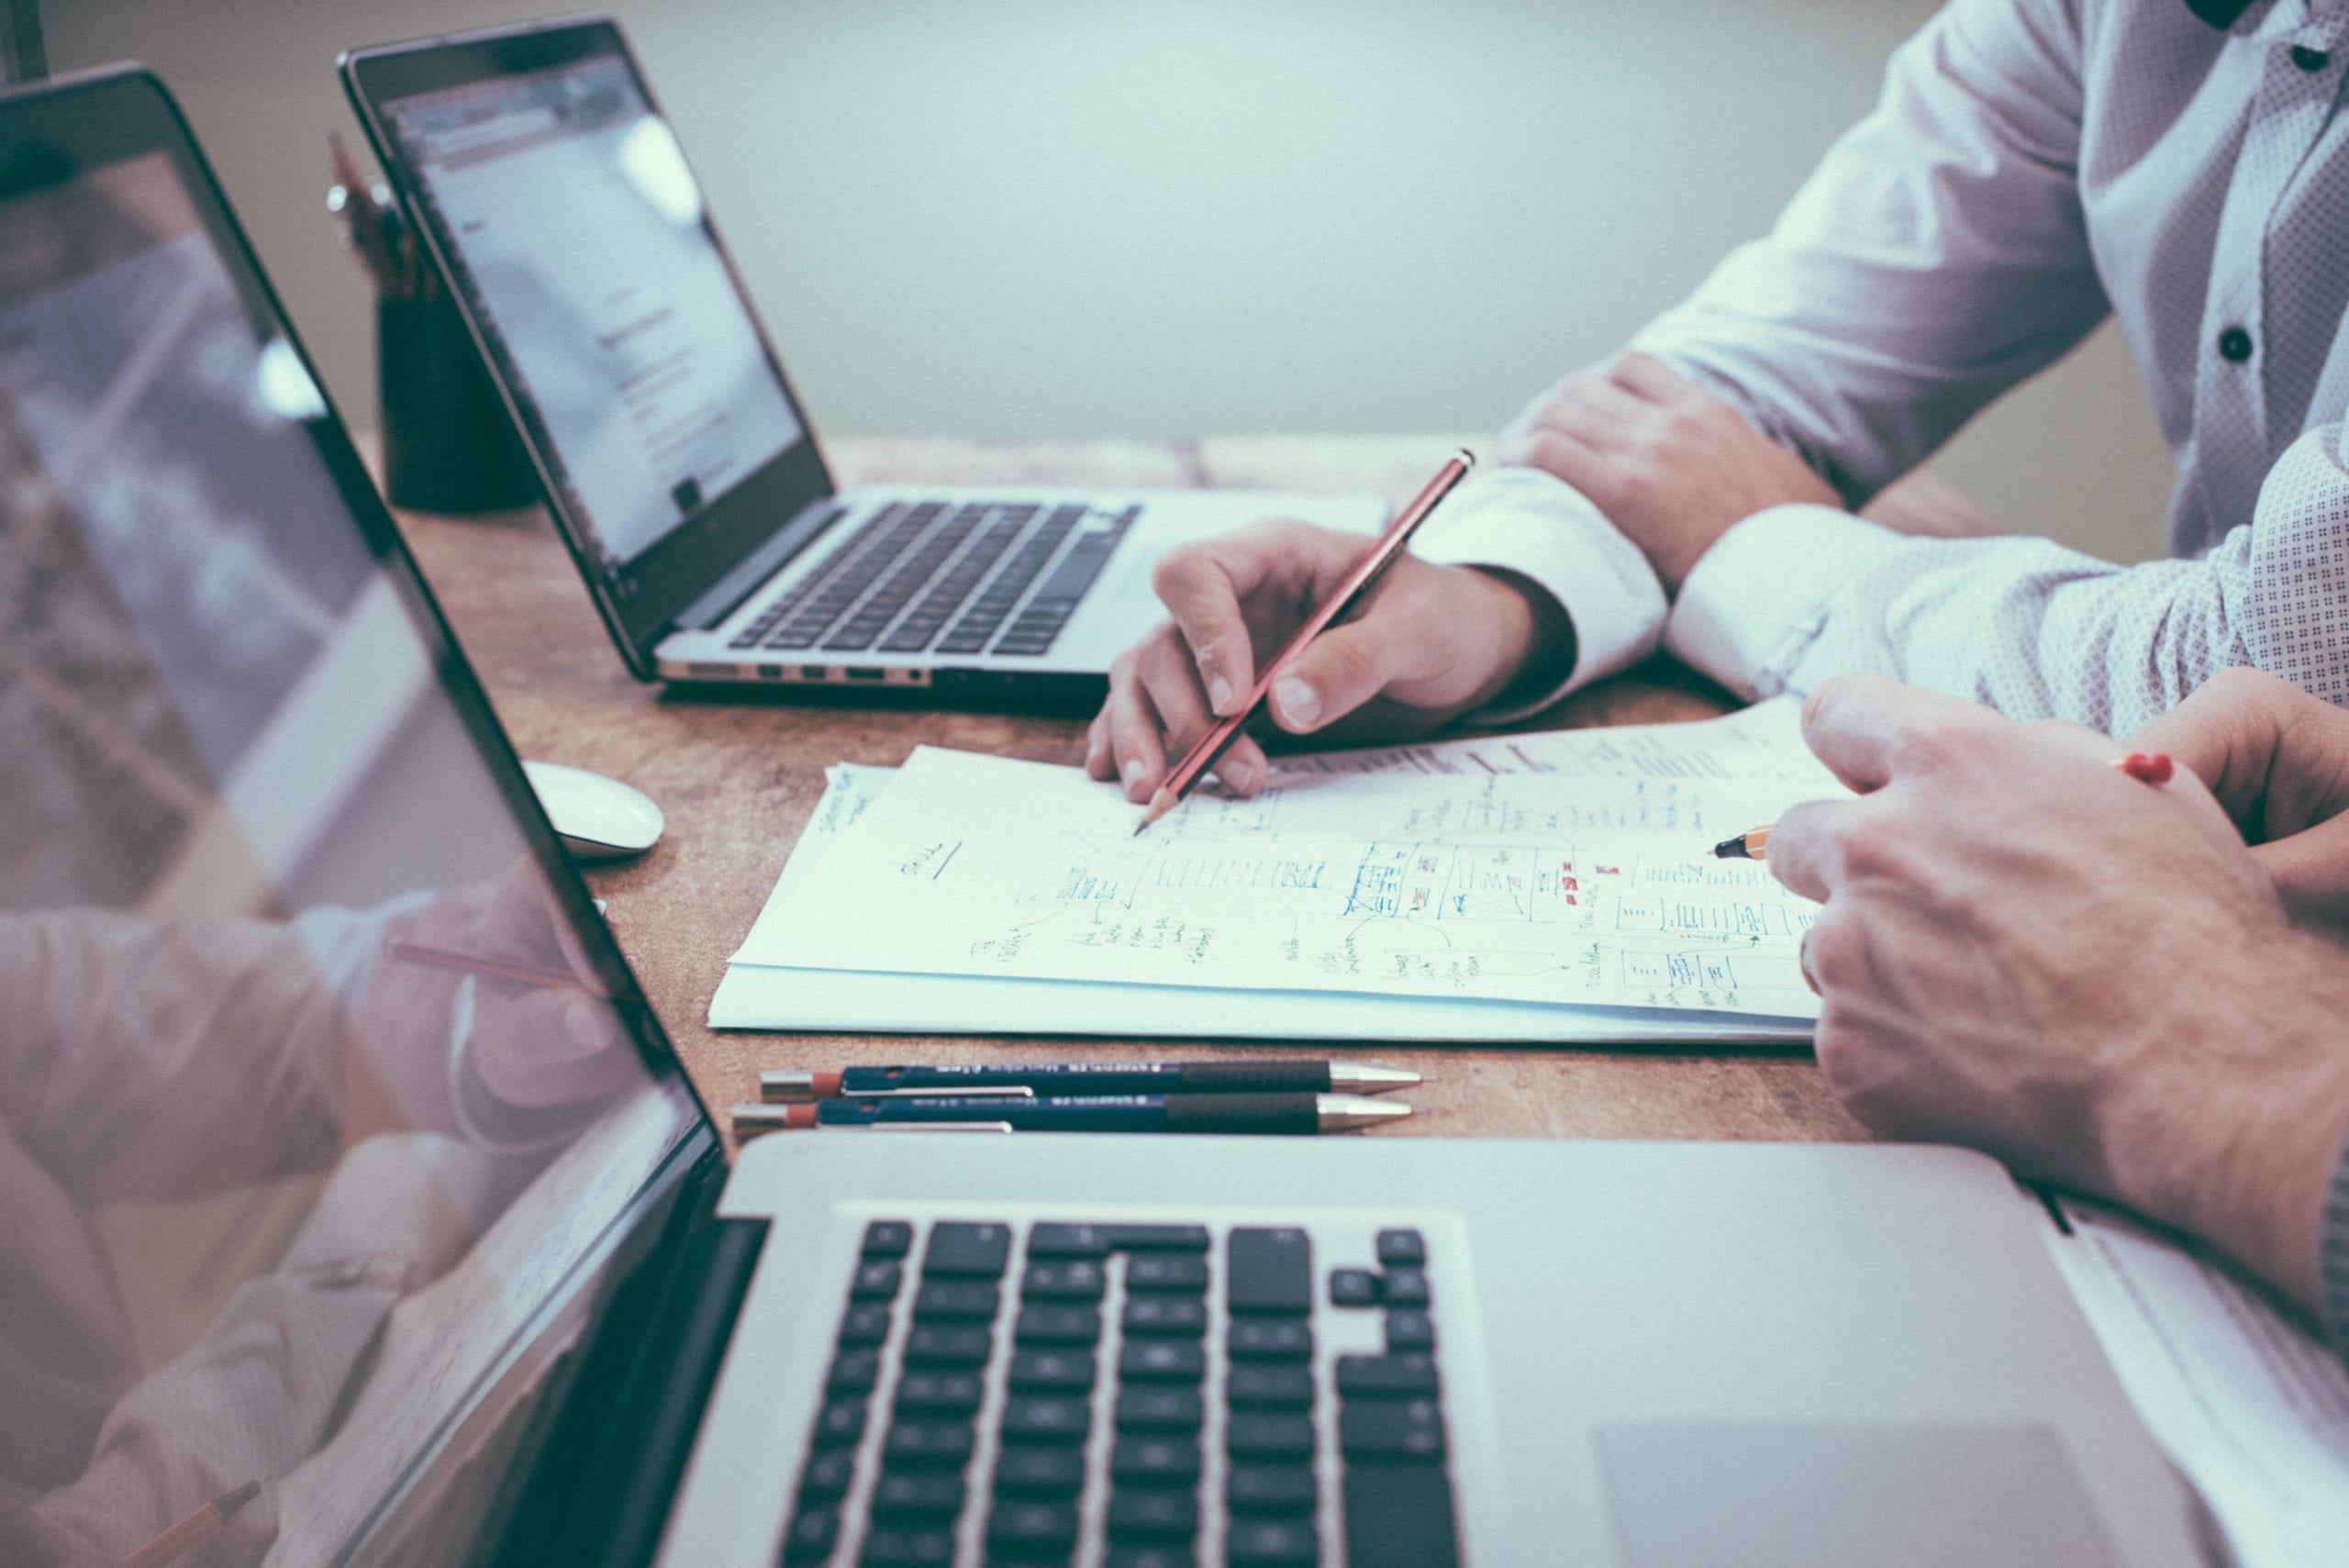 cincinnati industrial web development team at work